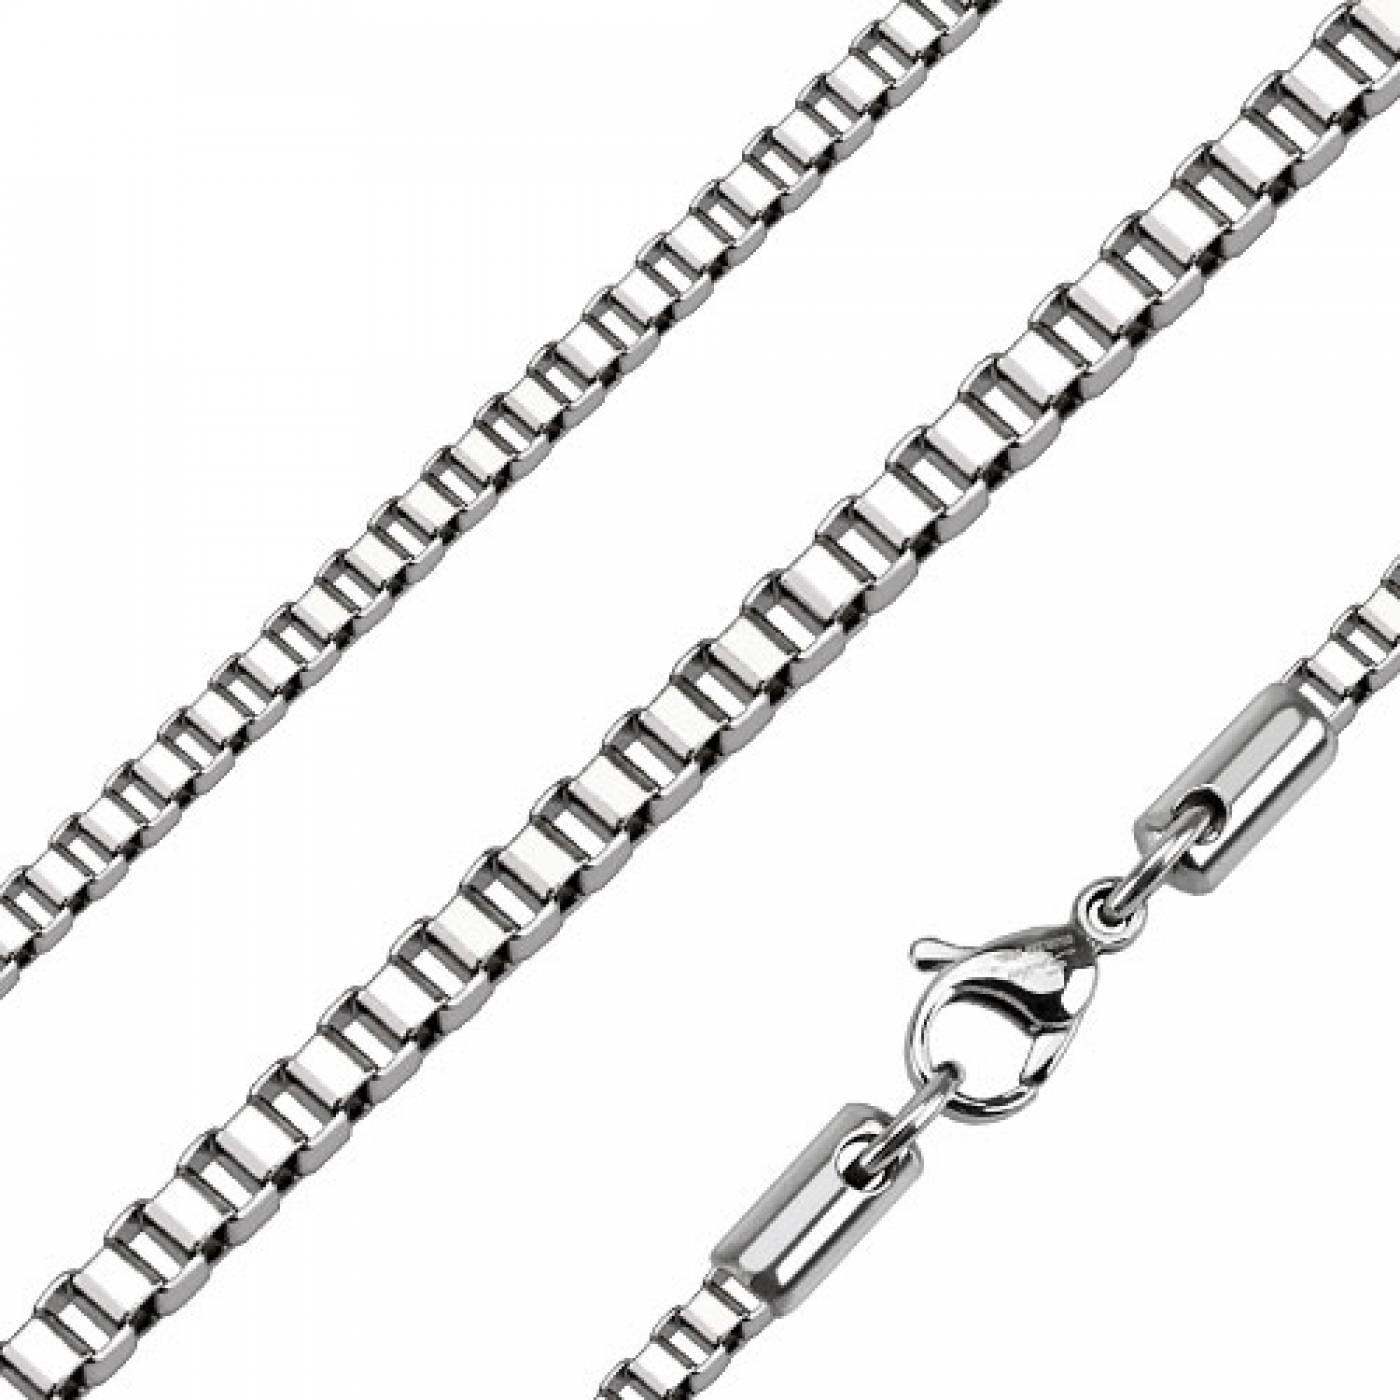 Eve Pi Chain